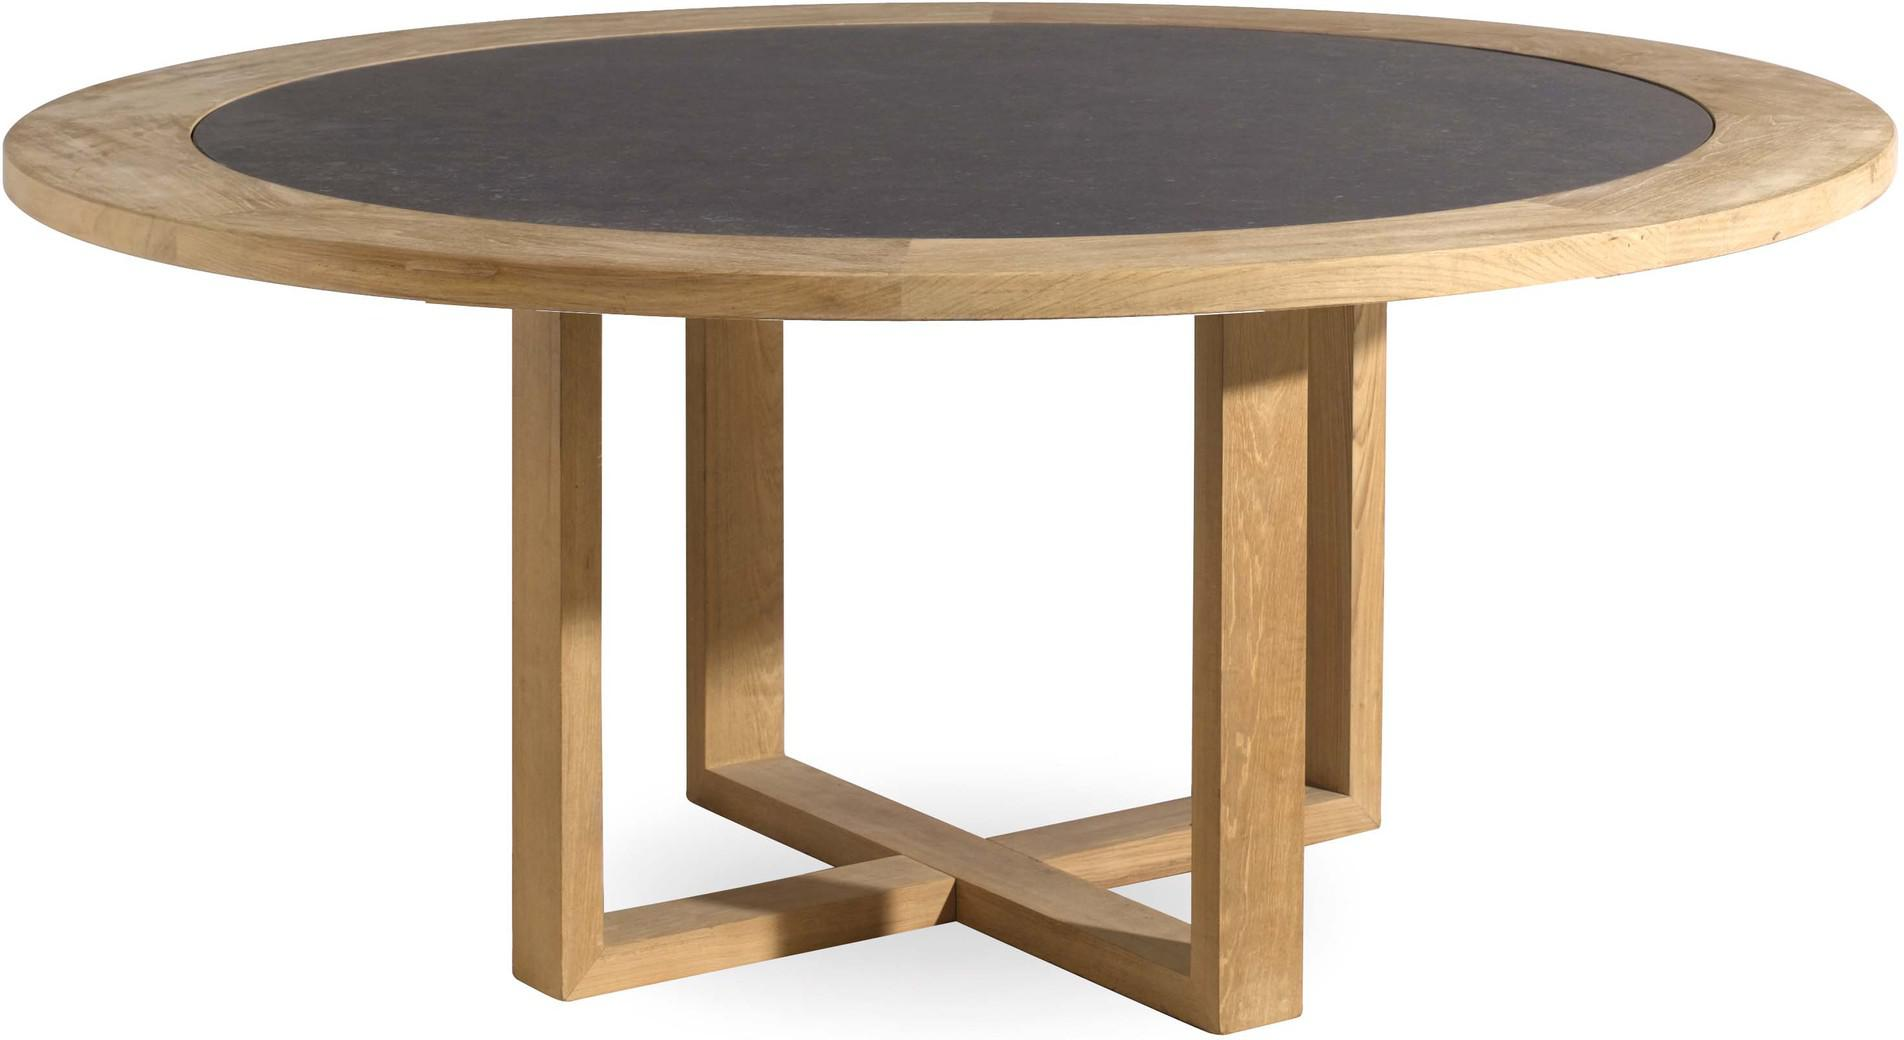 Siena Dining table - Teak - 40BD 150